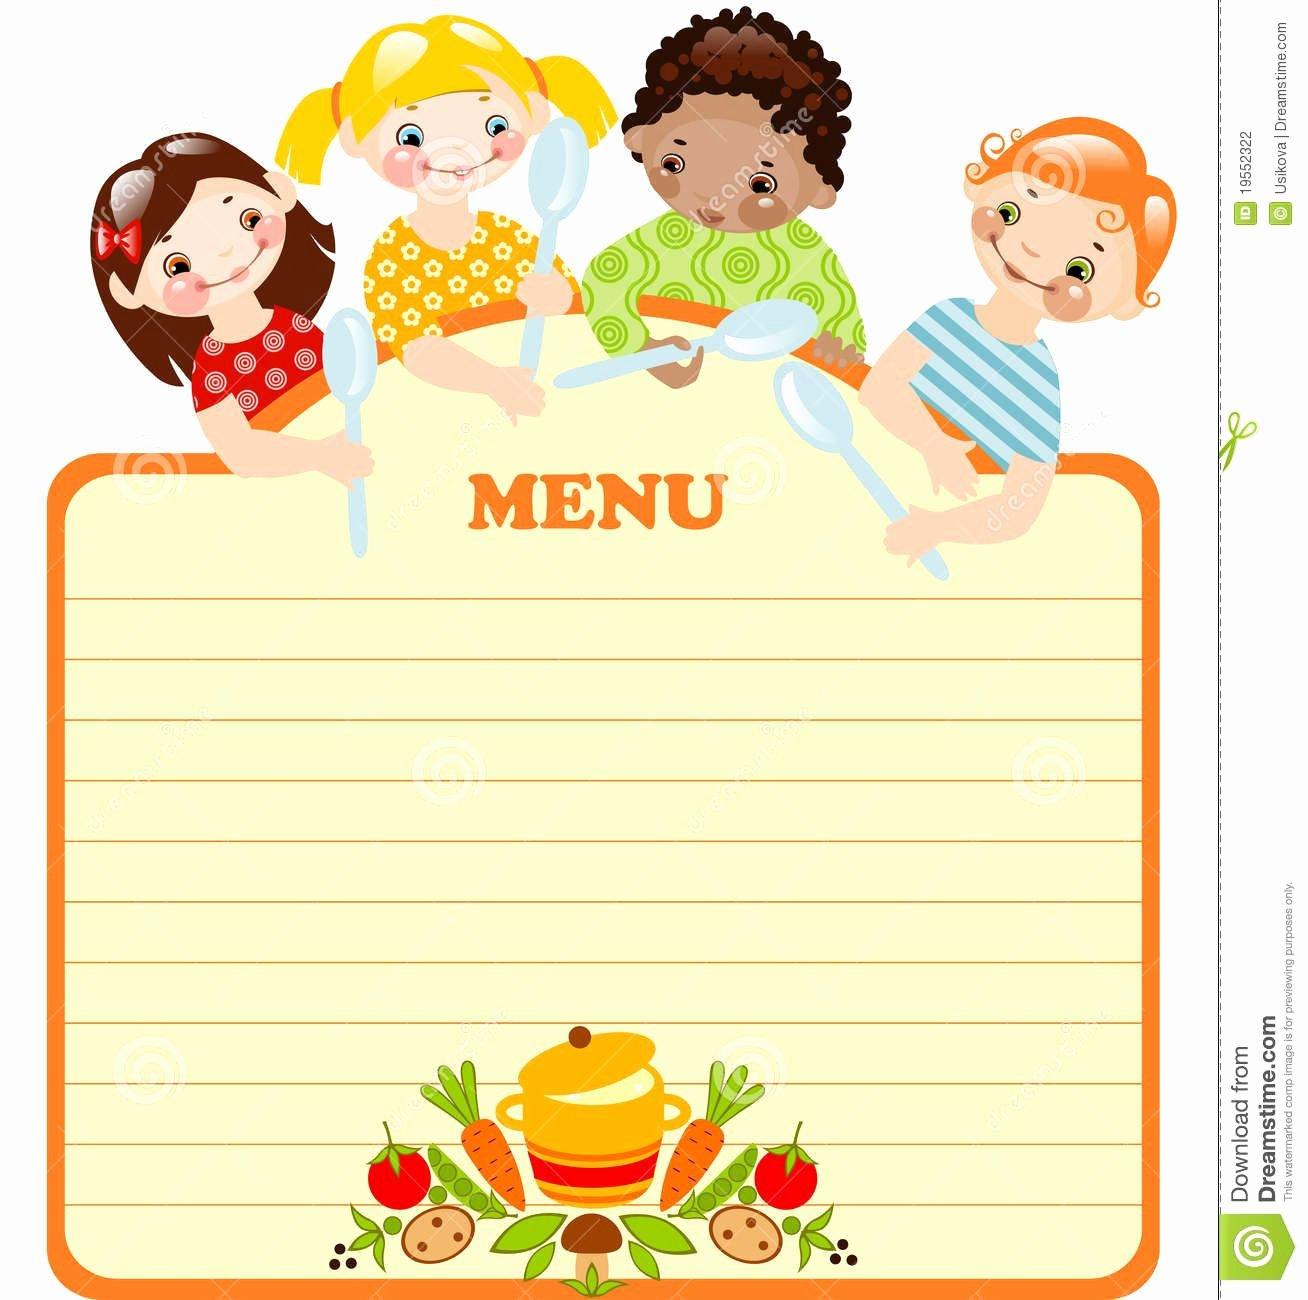 Blank Menu Template Lovely Blank Kids Menu Template Invitation Templates